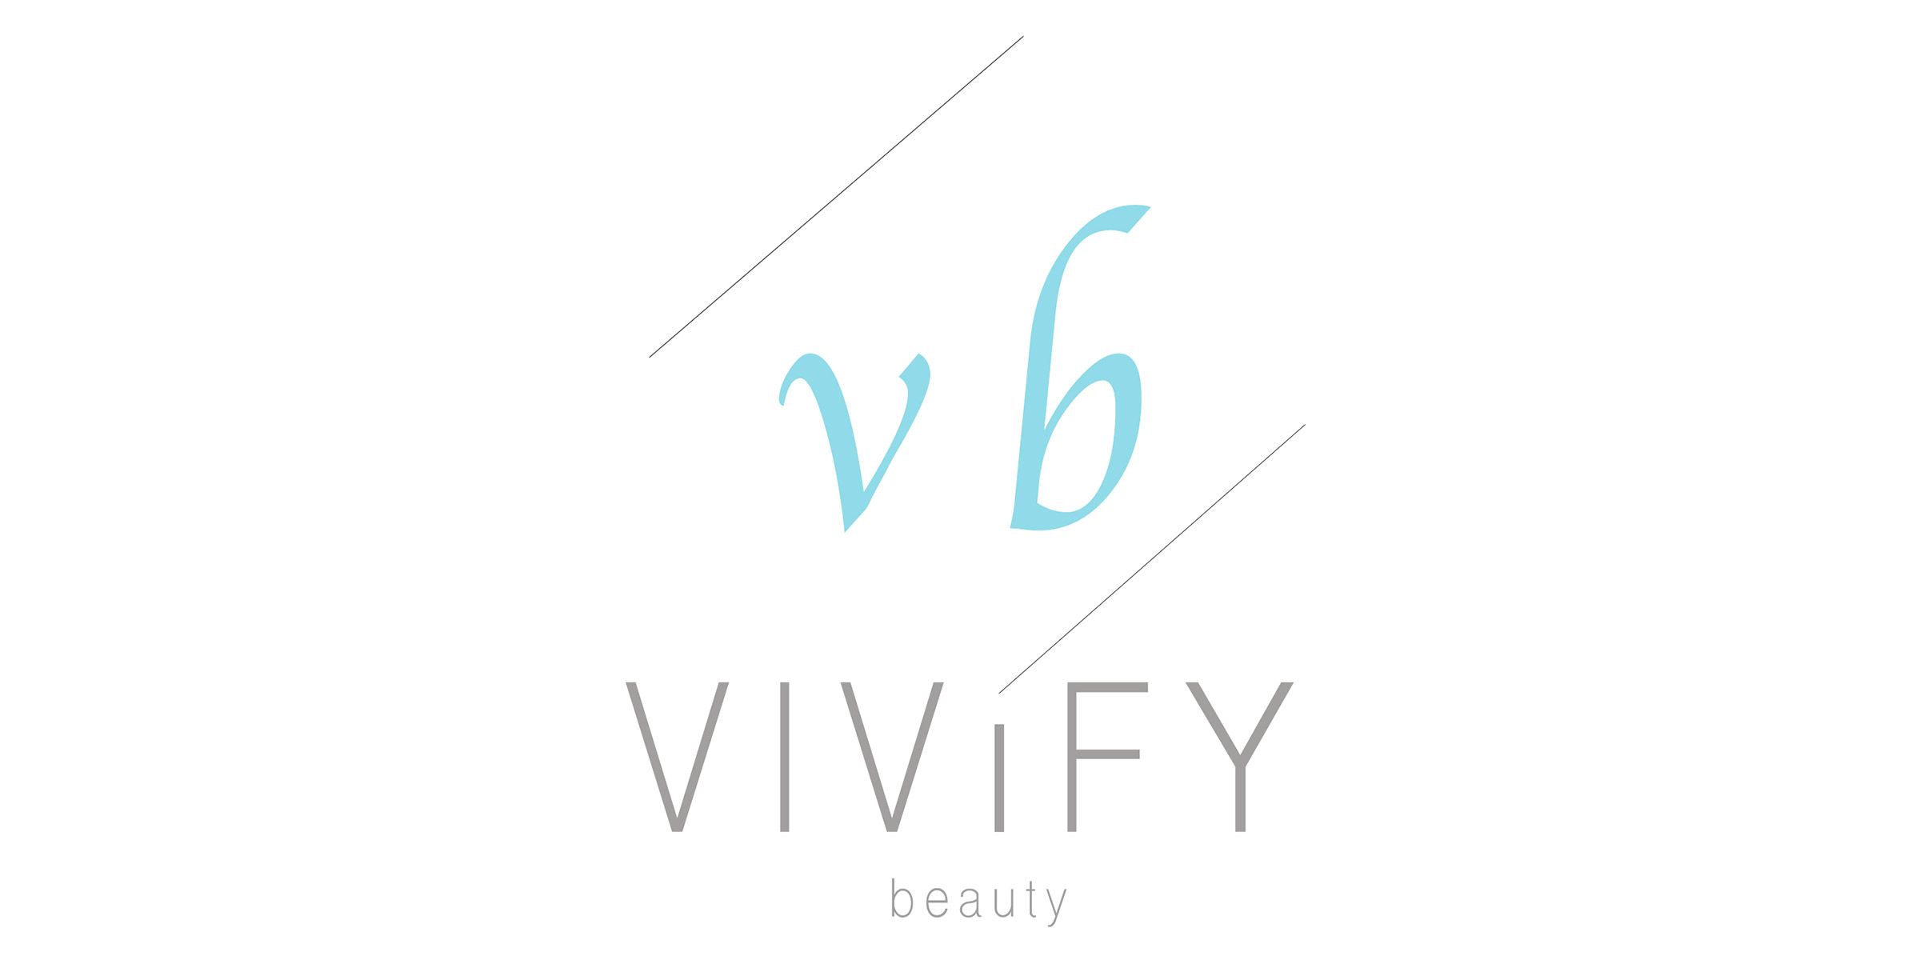 Vivify-Beauty-Logo-2400x1195.jpg